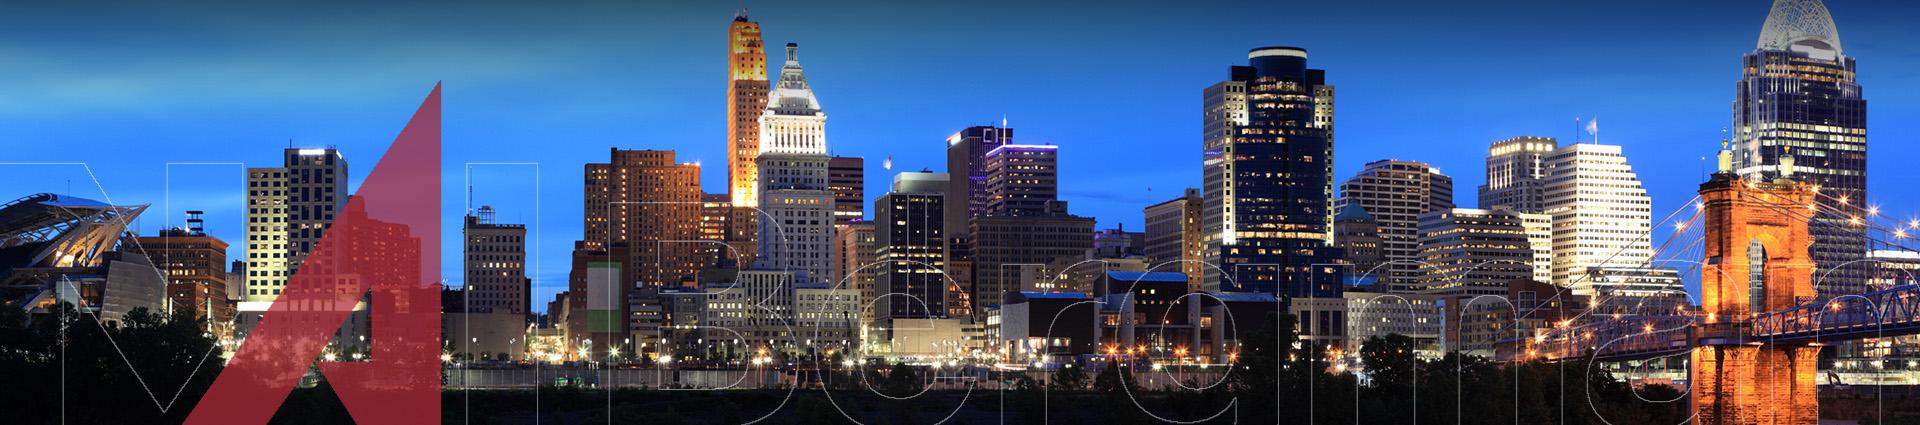 NAI Bergman, Leasing, Selling, Commercial Real Estate, CRE, Cincinnati Commercial Real Estate, Property Management, Cincinnati, Dayton, Office, Retail, Industrial, Medical, Multi Family, Land, Investment, Cincinnati News, Dayton News